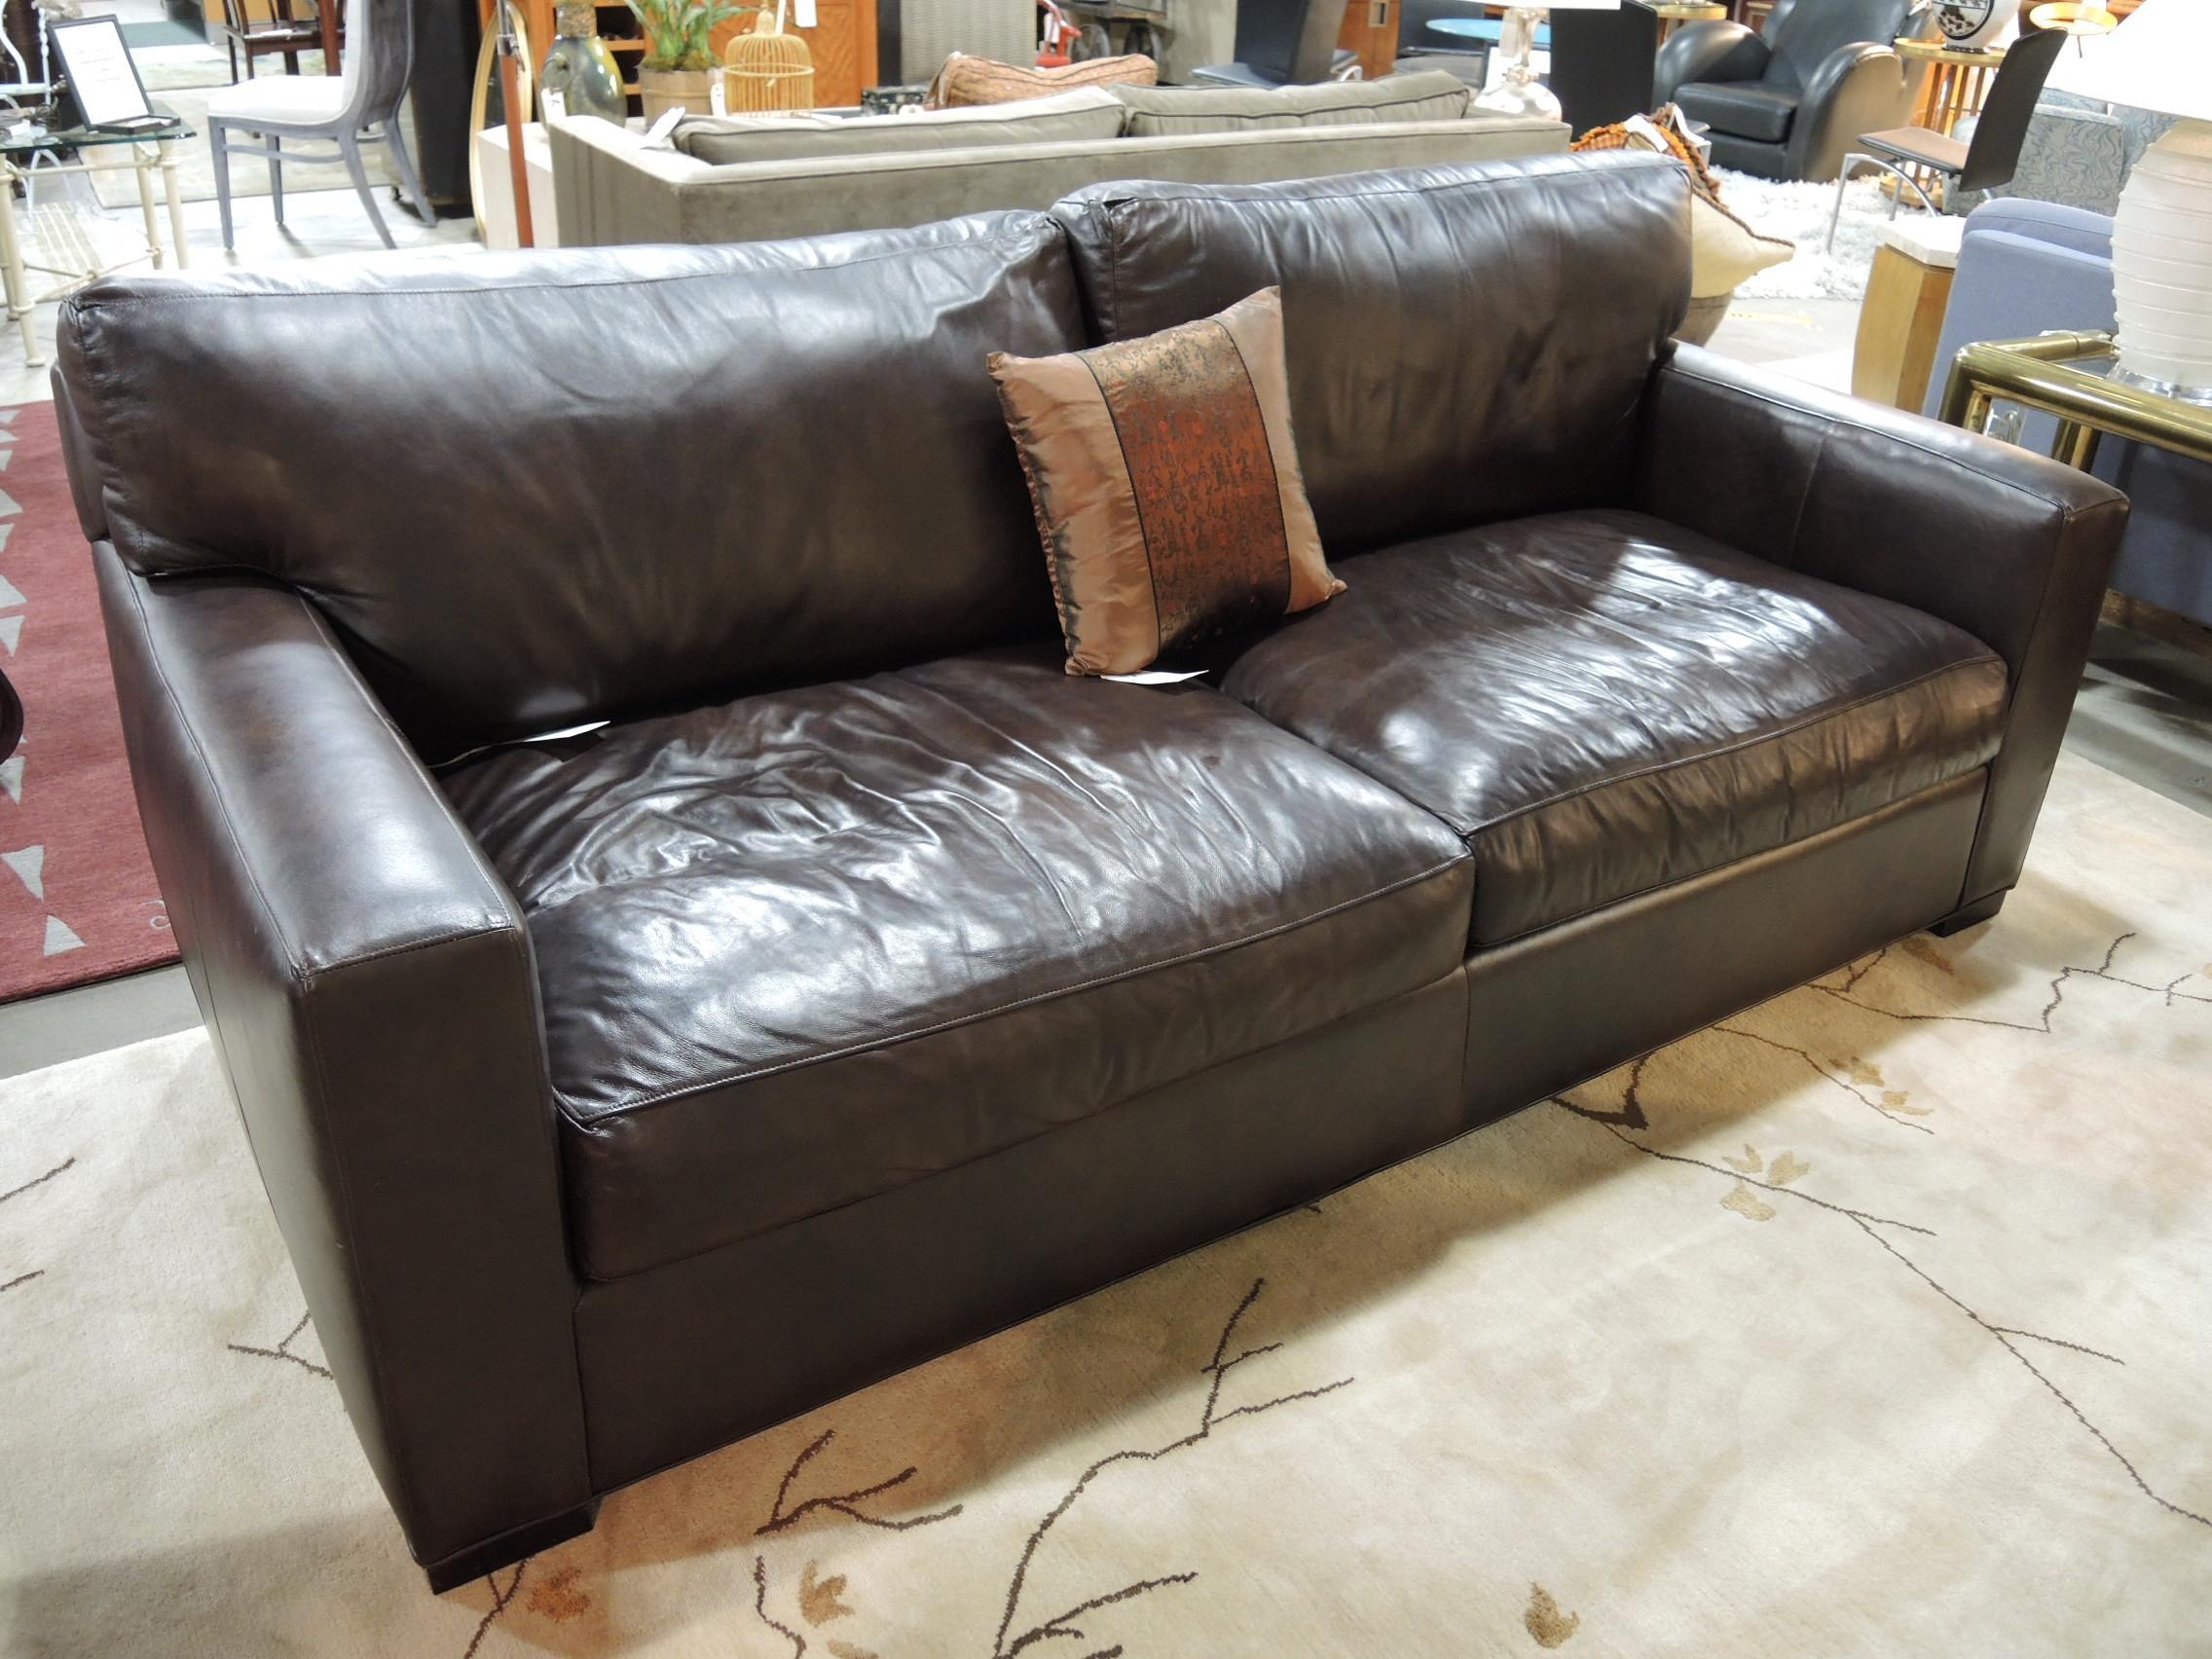 Davis Sleeper Sofa | Sofa Gallery | Kengire Regarding Crate And Barrel Sleeper Sofas (View 10 of 20)